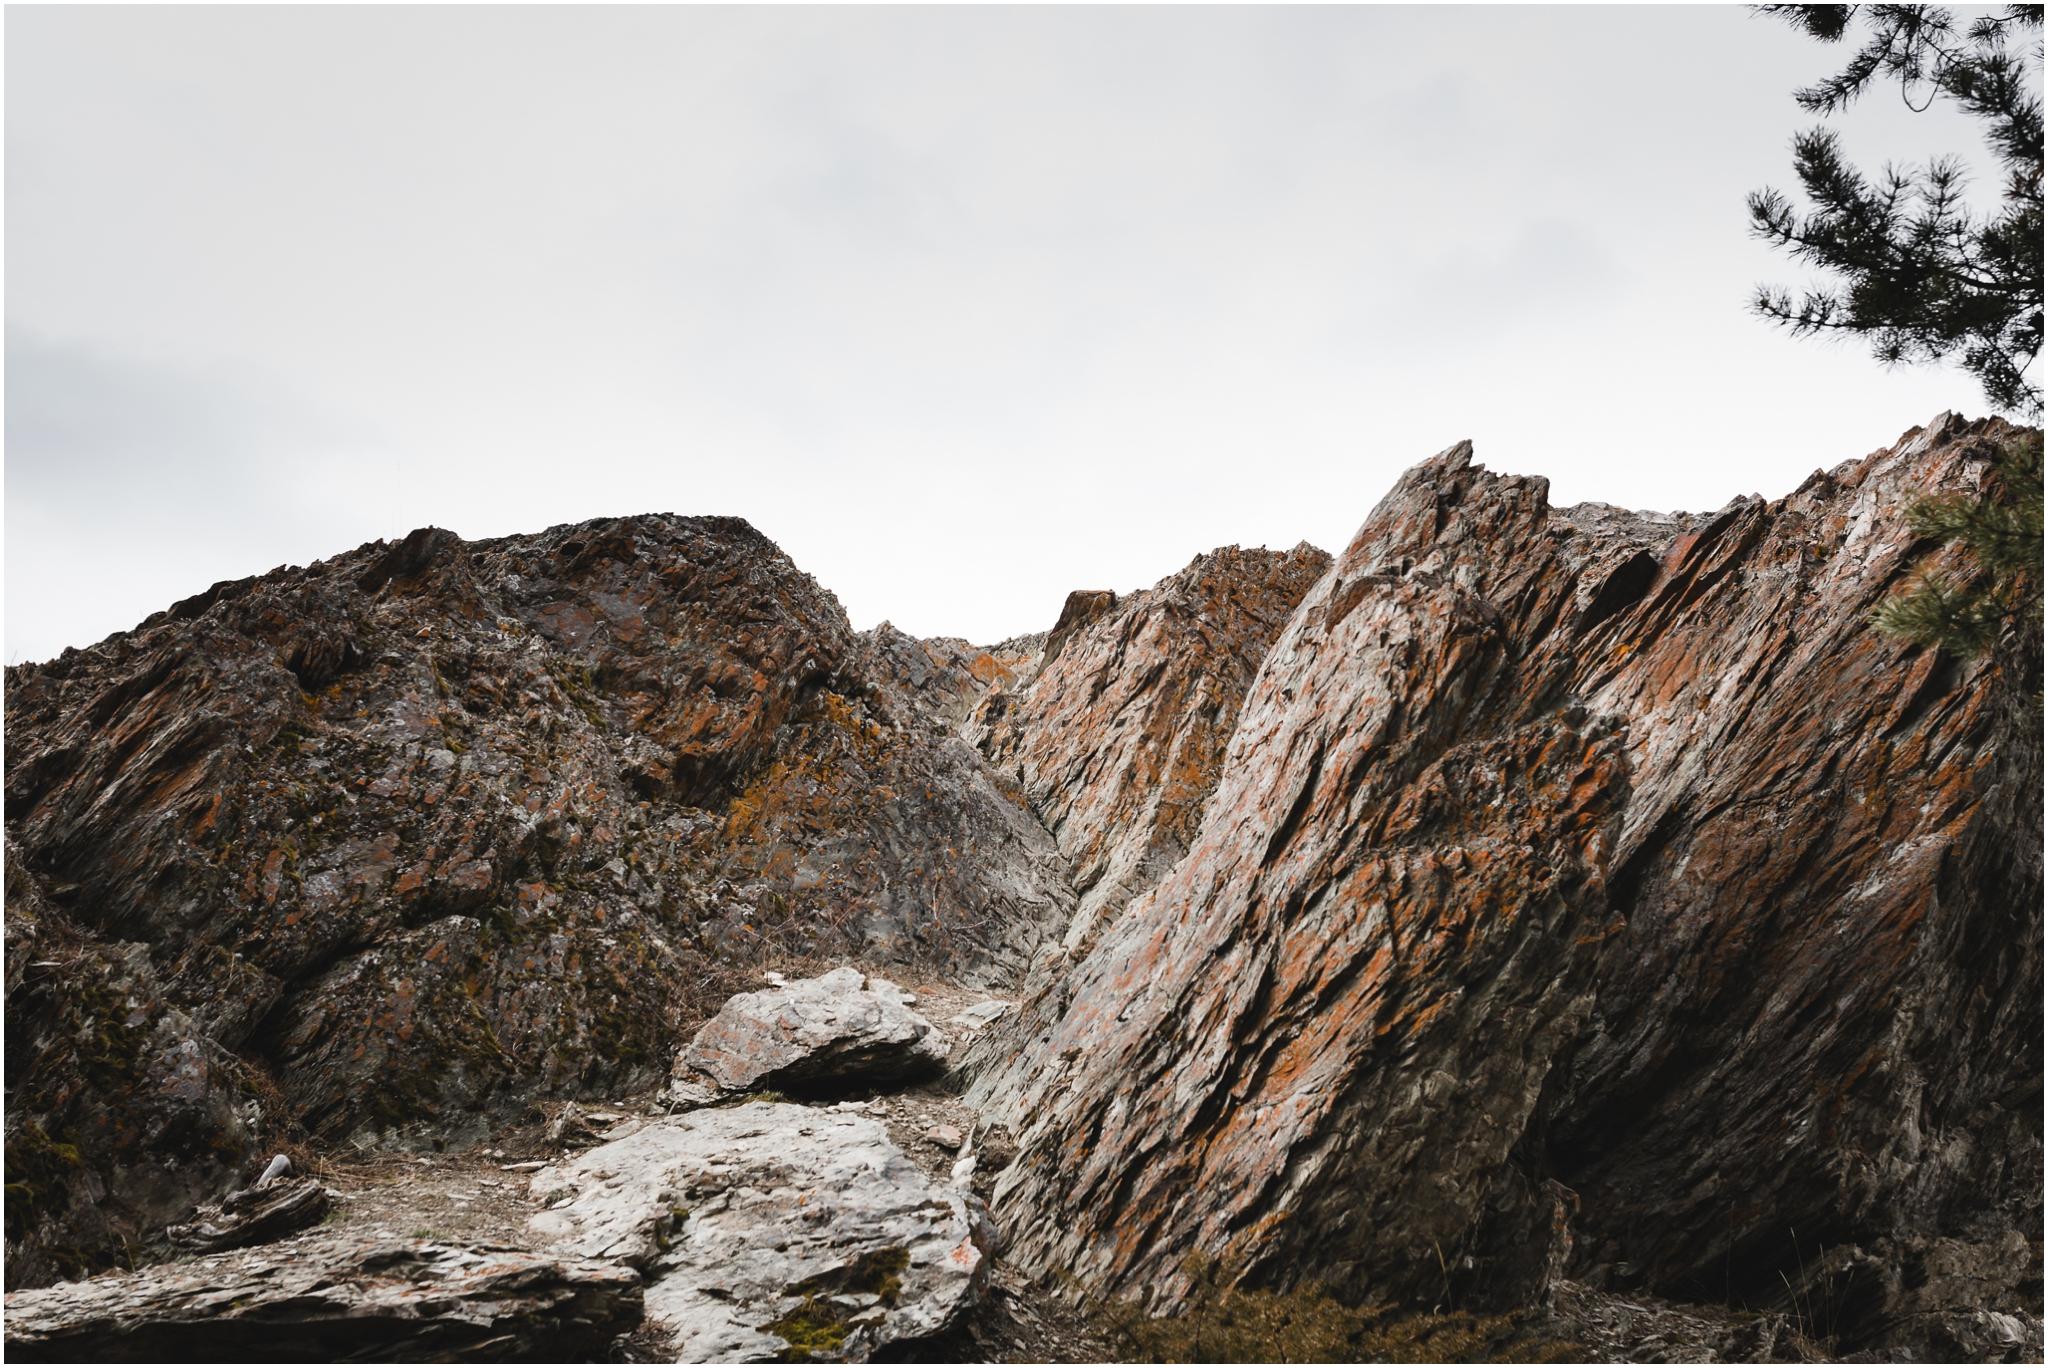 Jasper National Park - Old Fort Point - Rock Formation - Canadian Rocky Mountains - Rockies - Treelines Photography - Edmonton Travel Photographer